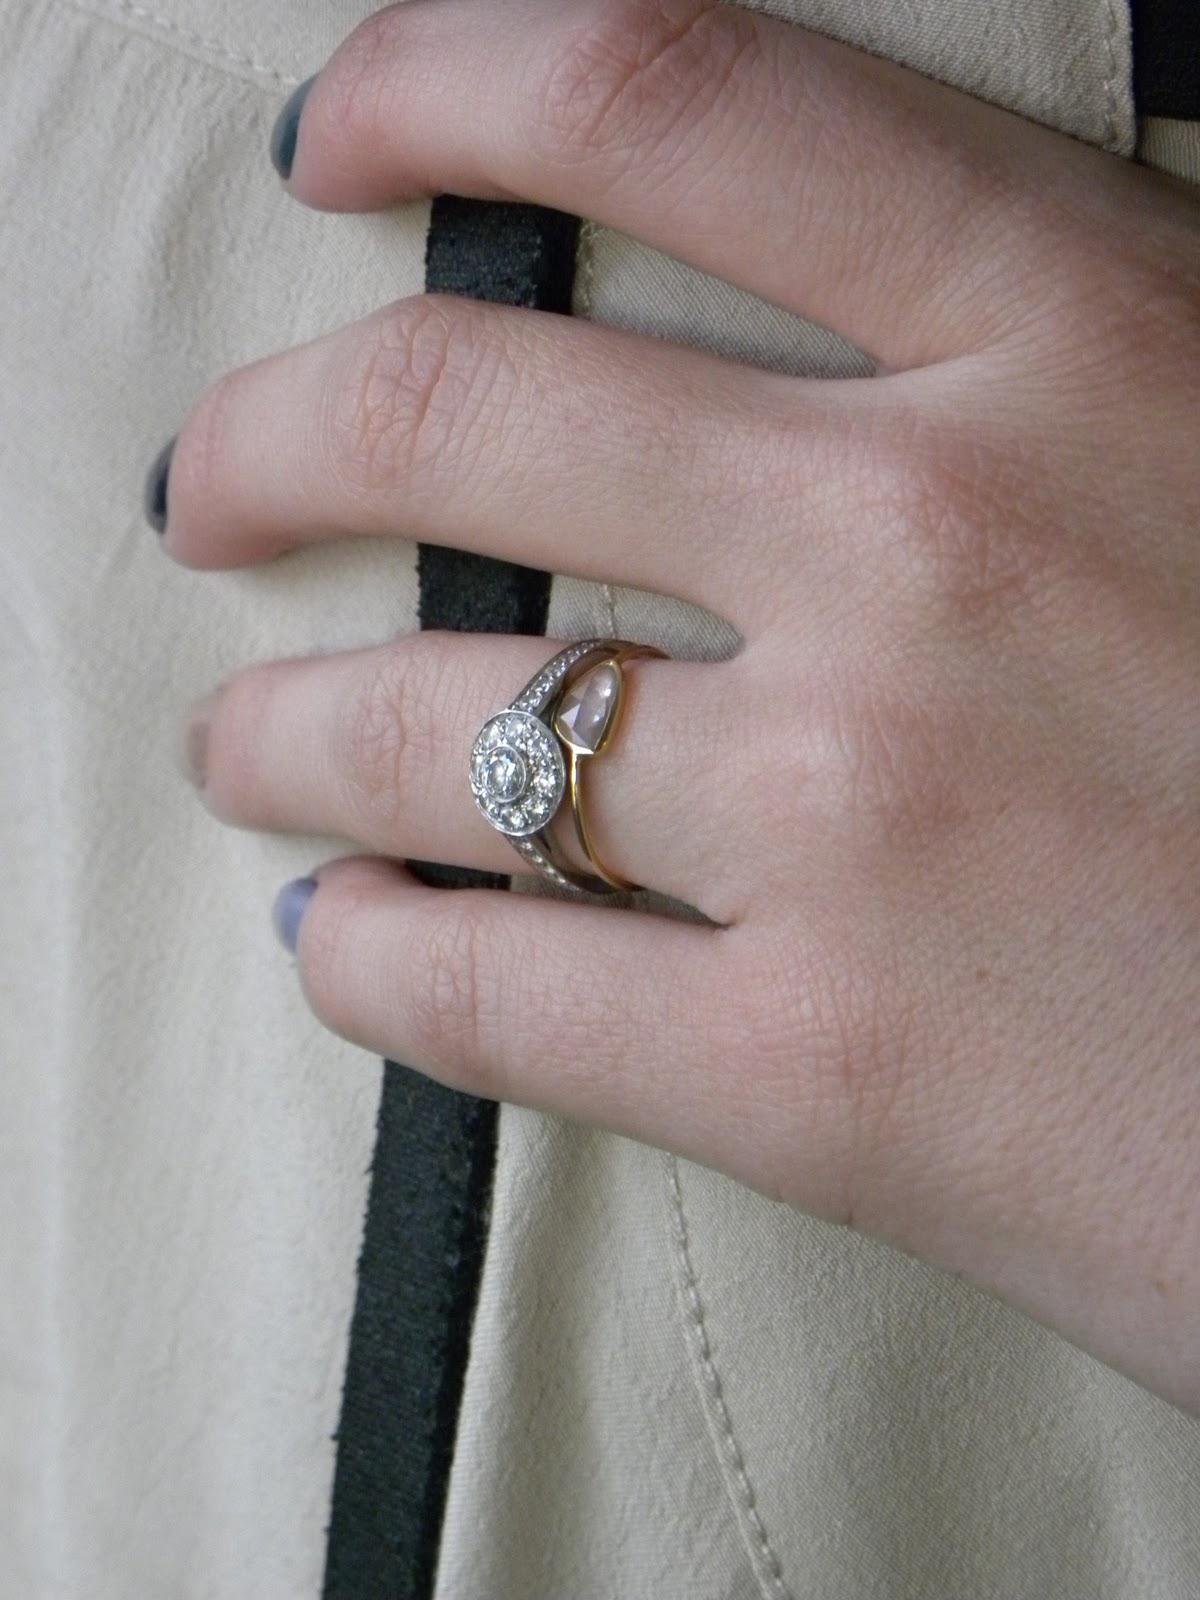 Do Men Wear Engagement Rings Too